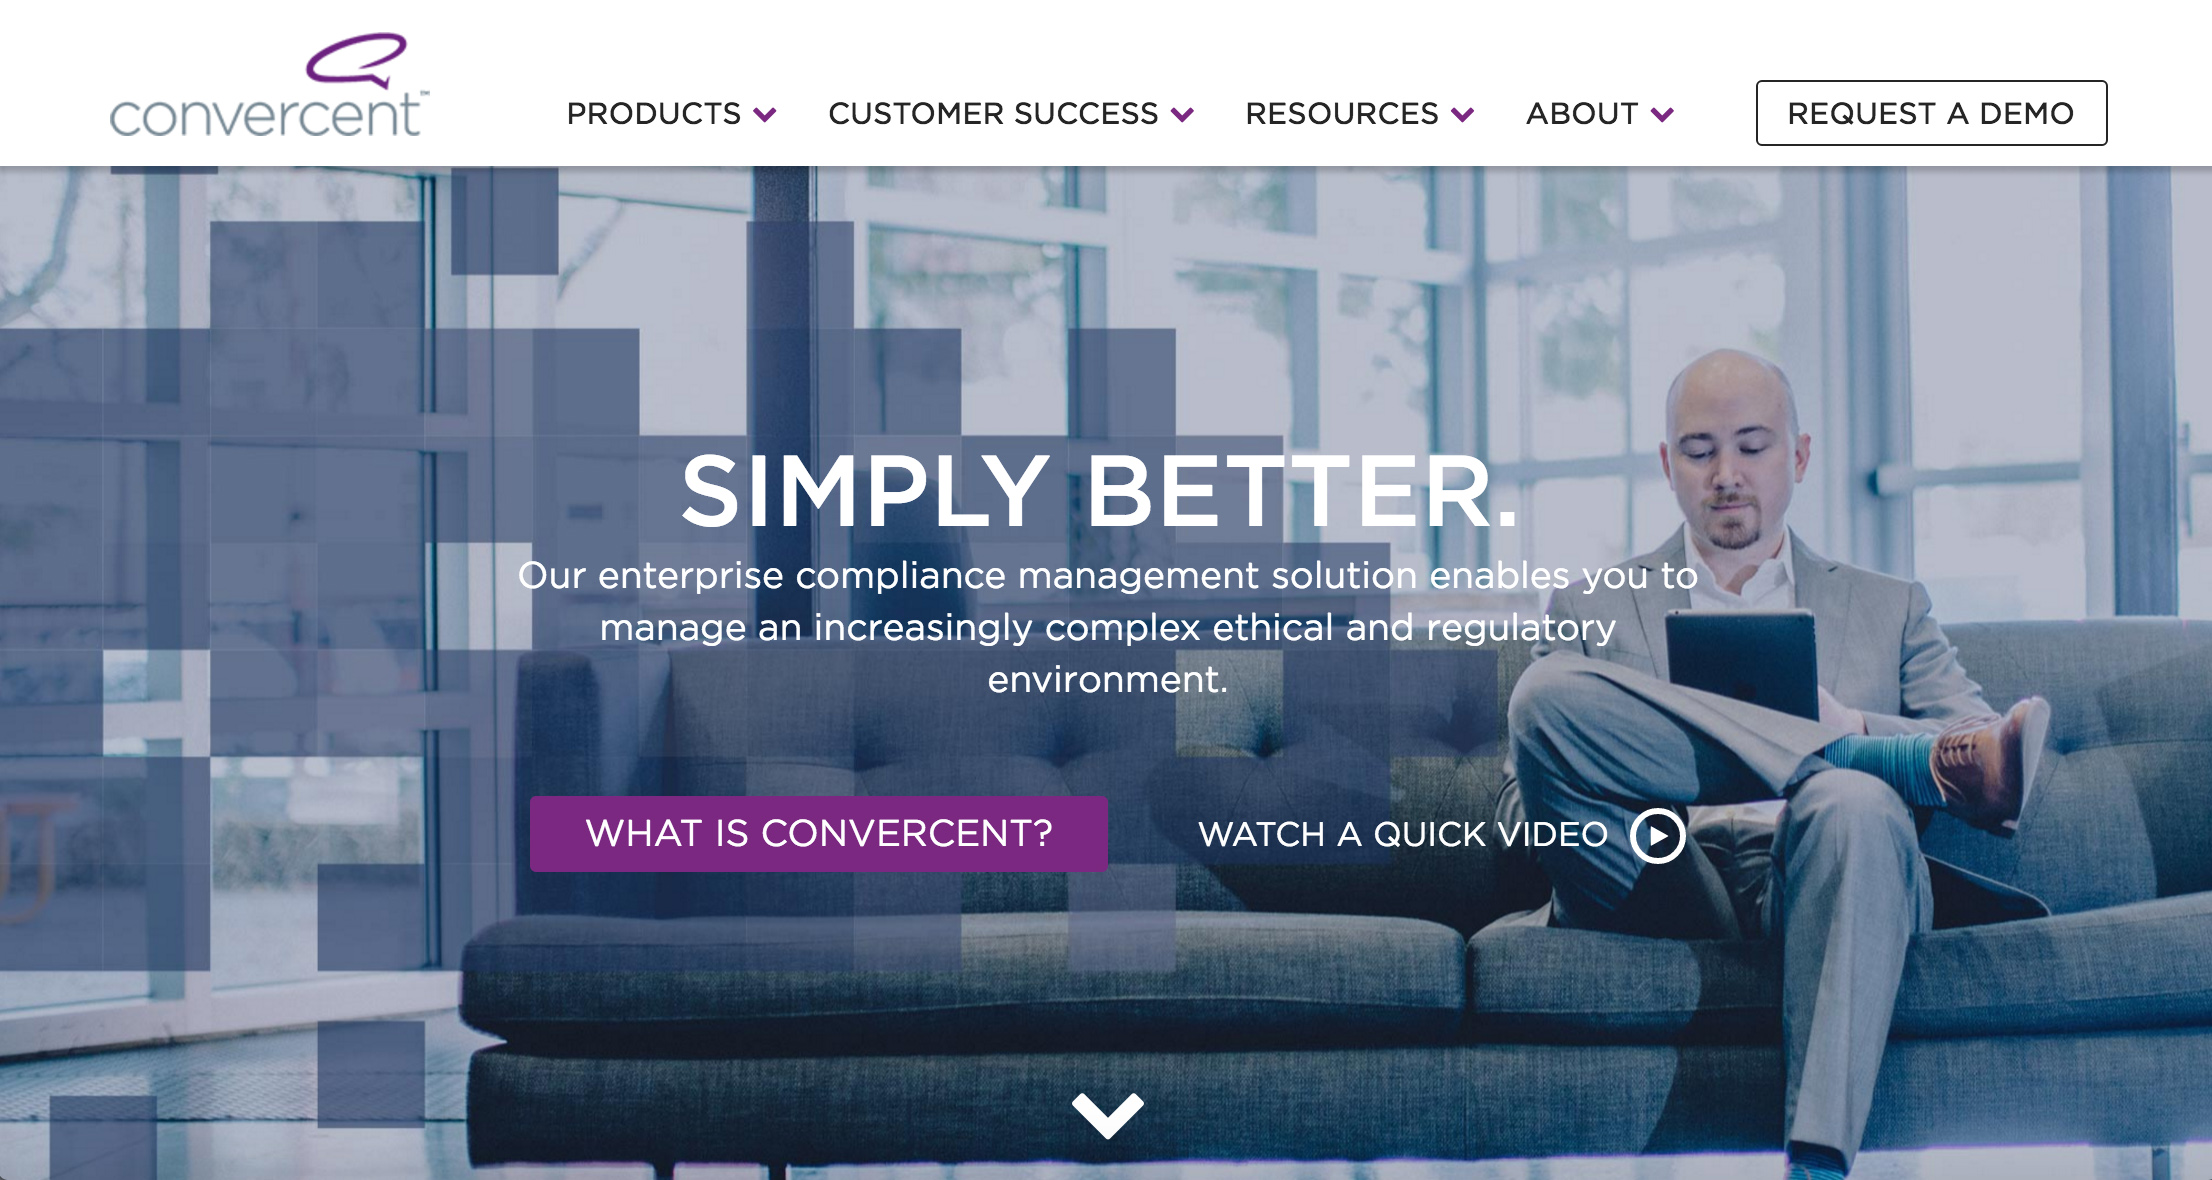 Convercent website